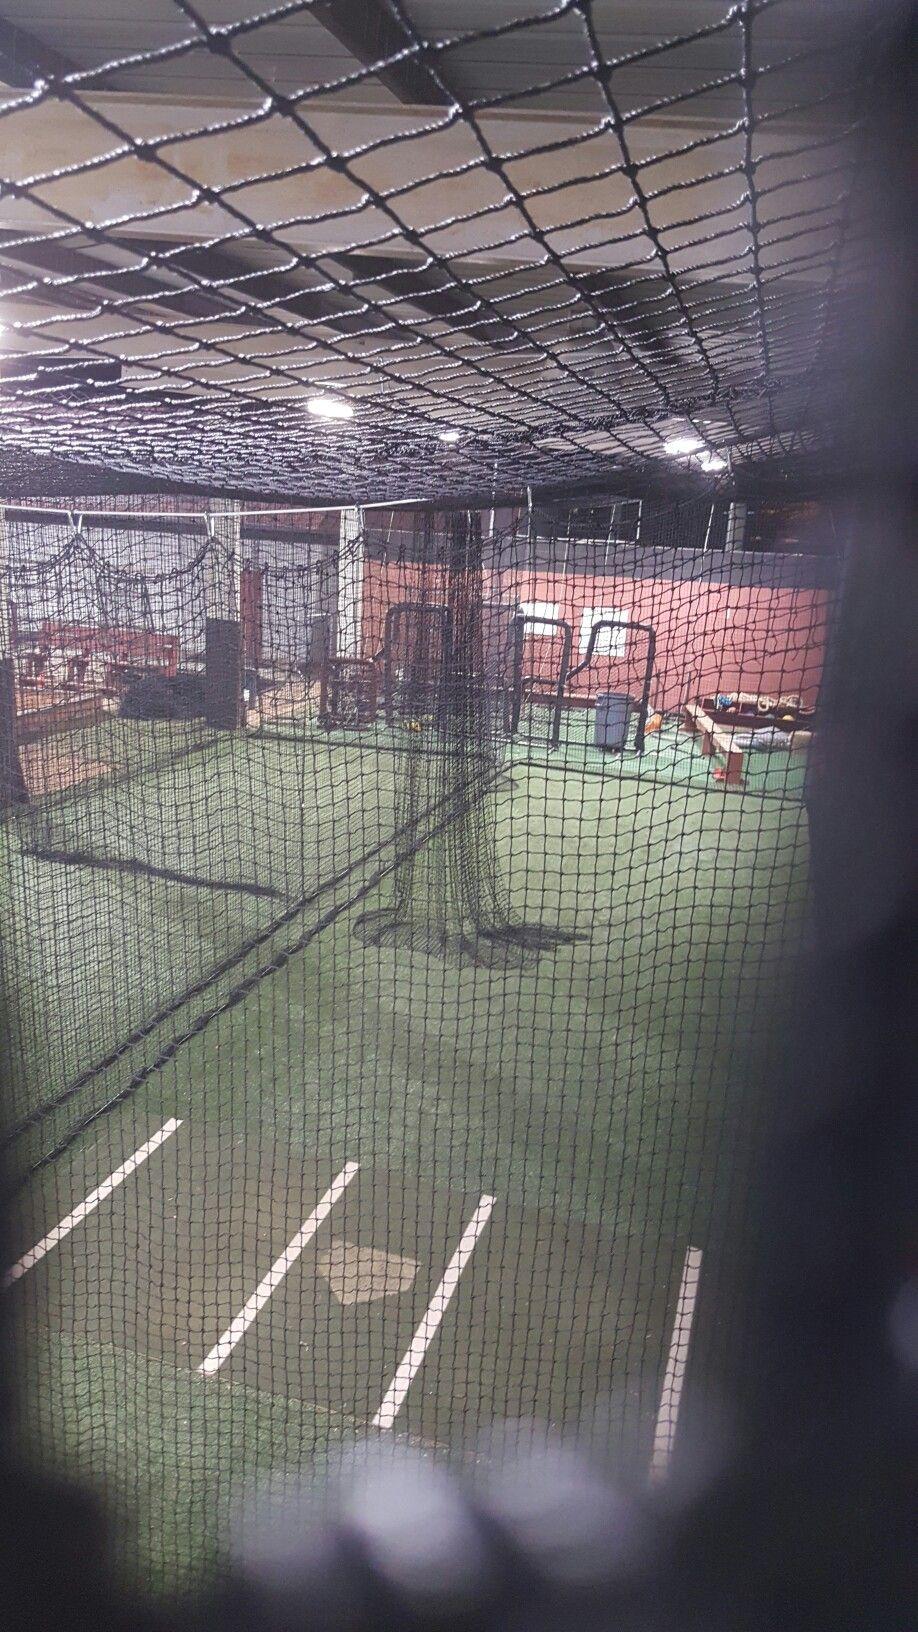 top view of a batting cage custom made indoor baseball batting